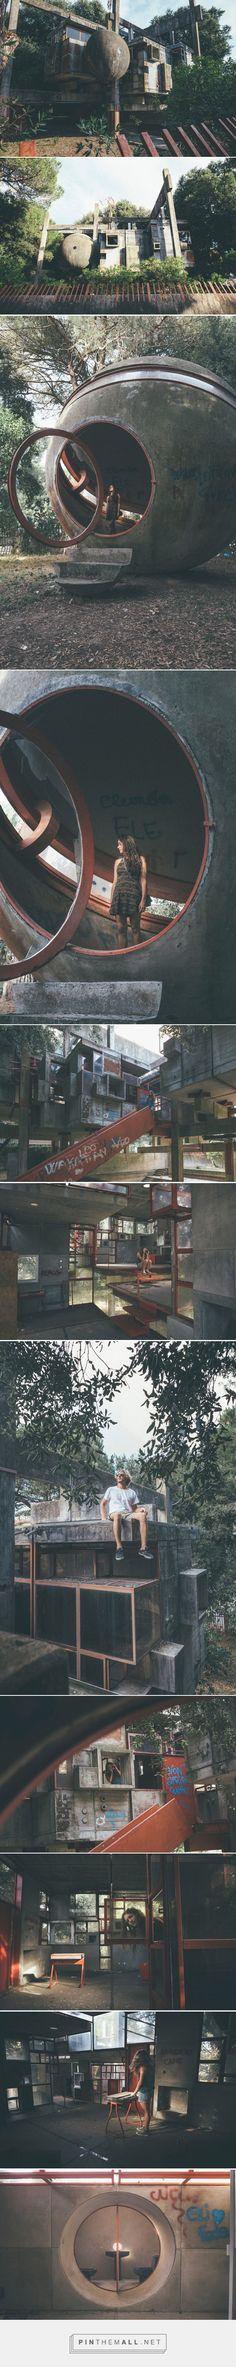 Casa sperimentale